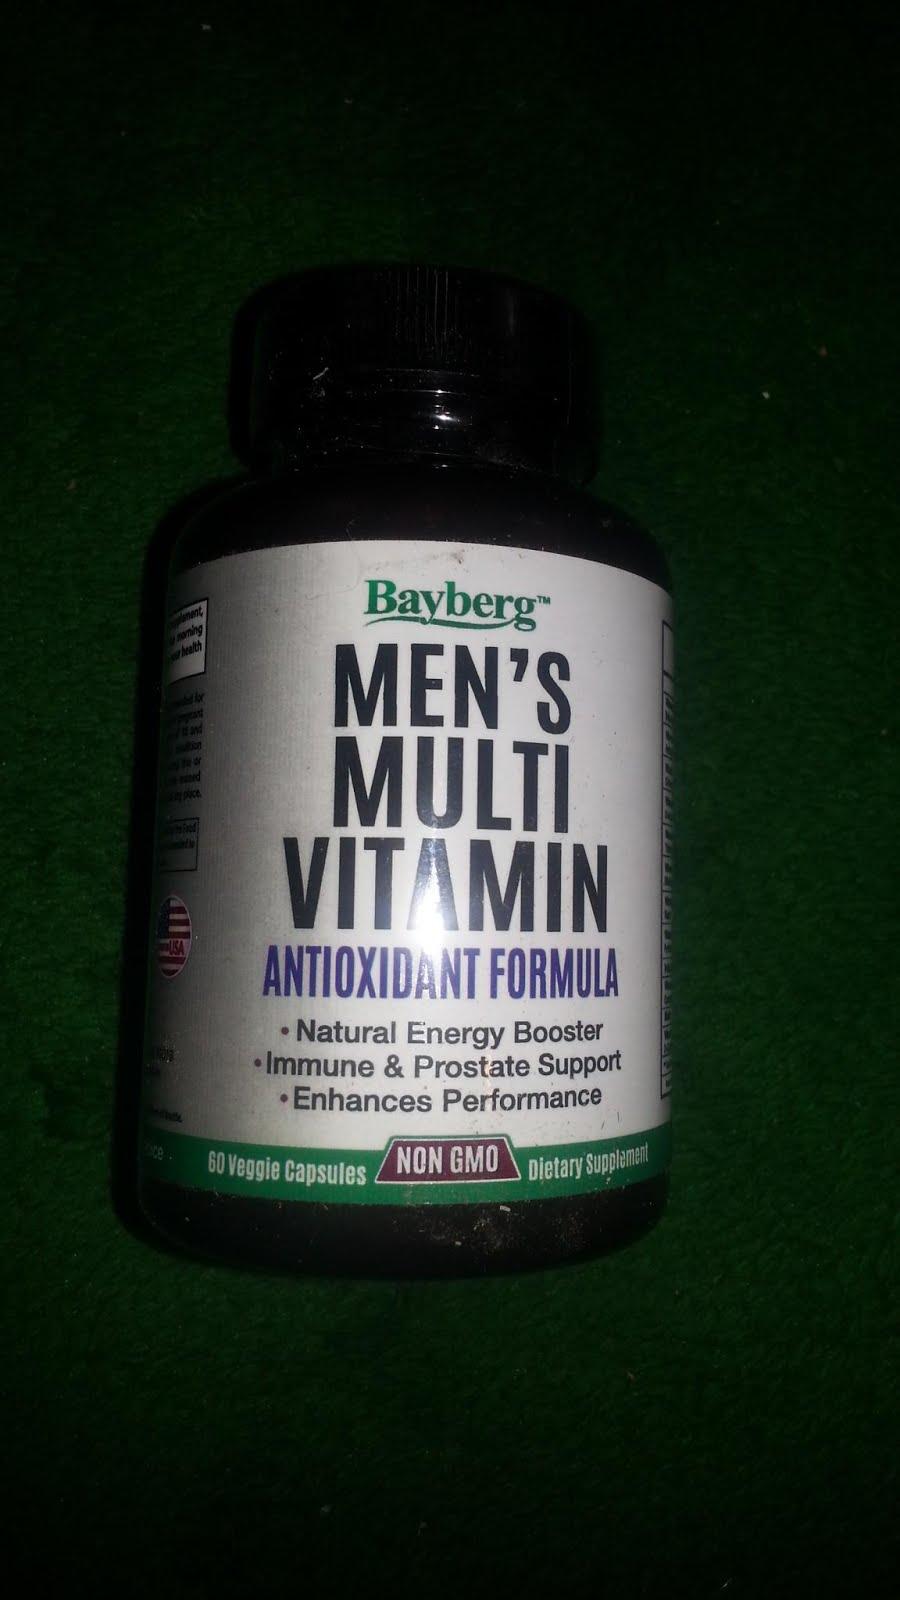 Bayberg Men's Multivitamin Antioxidant Energy Supplement with